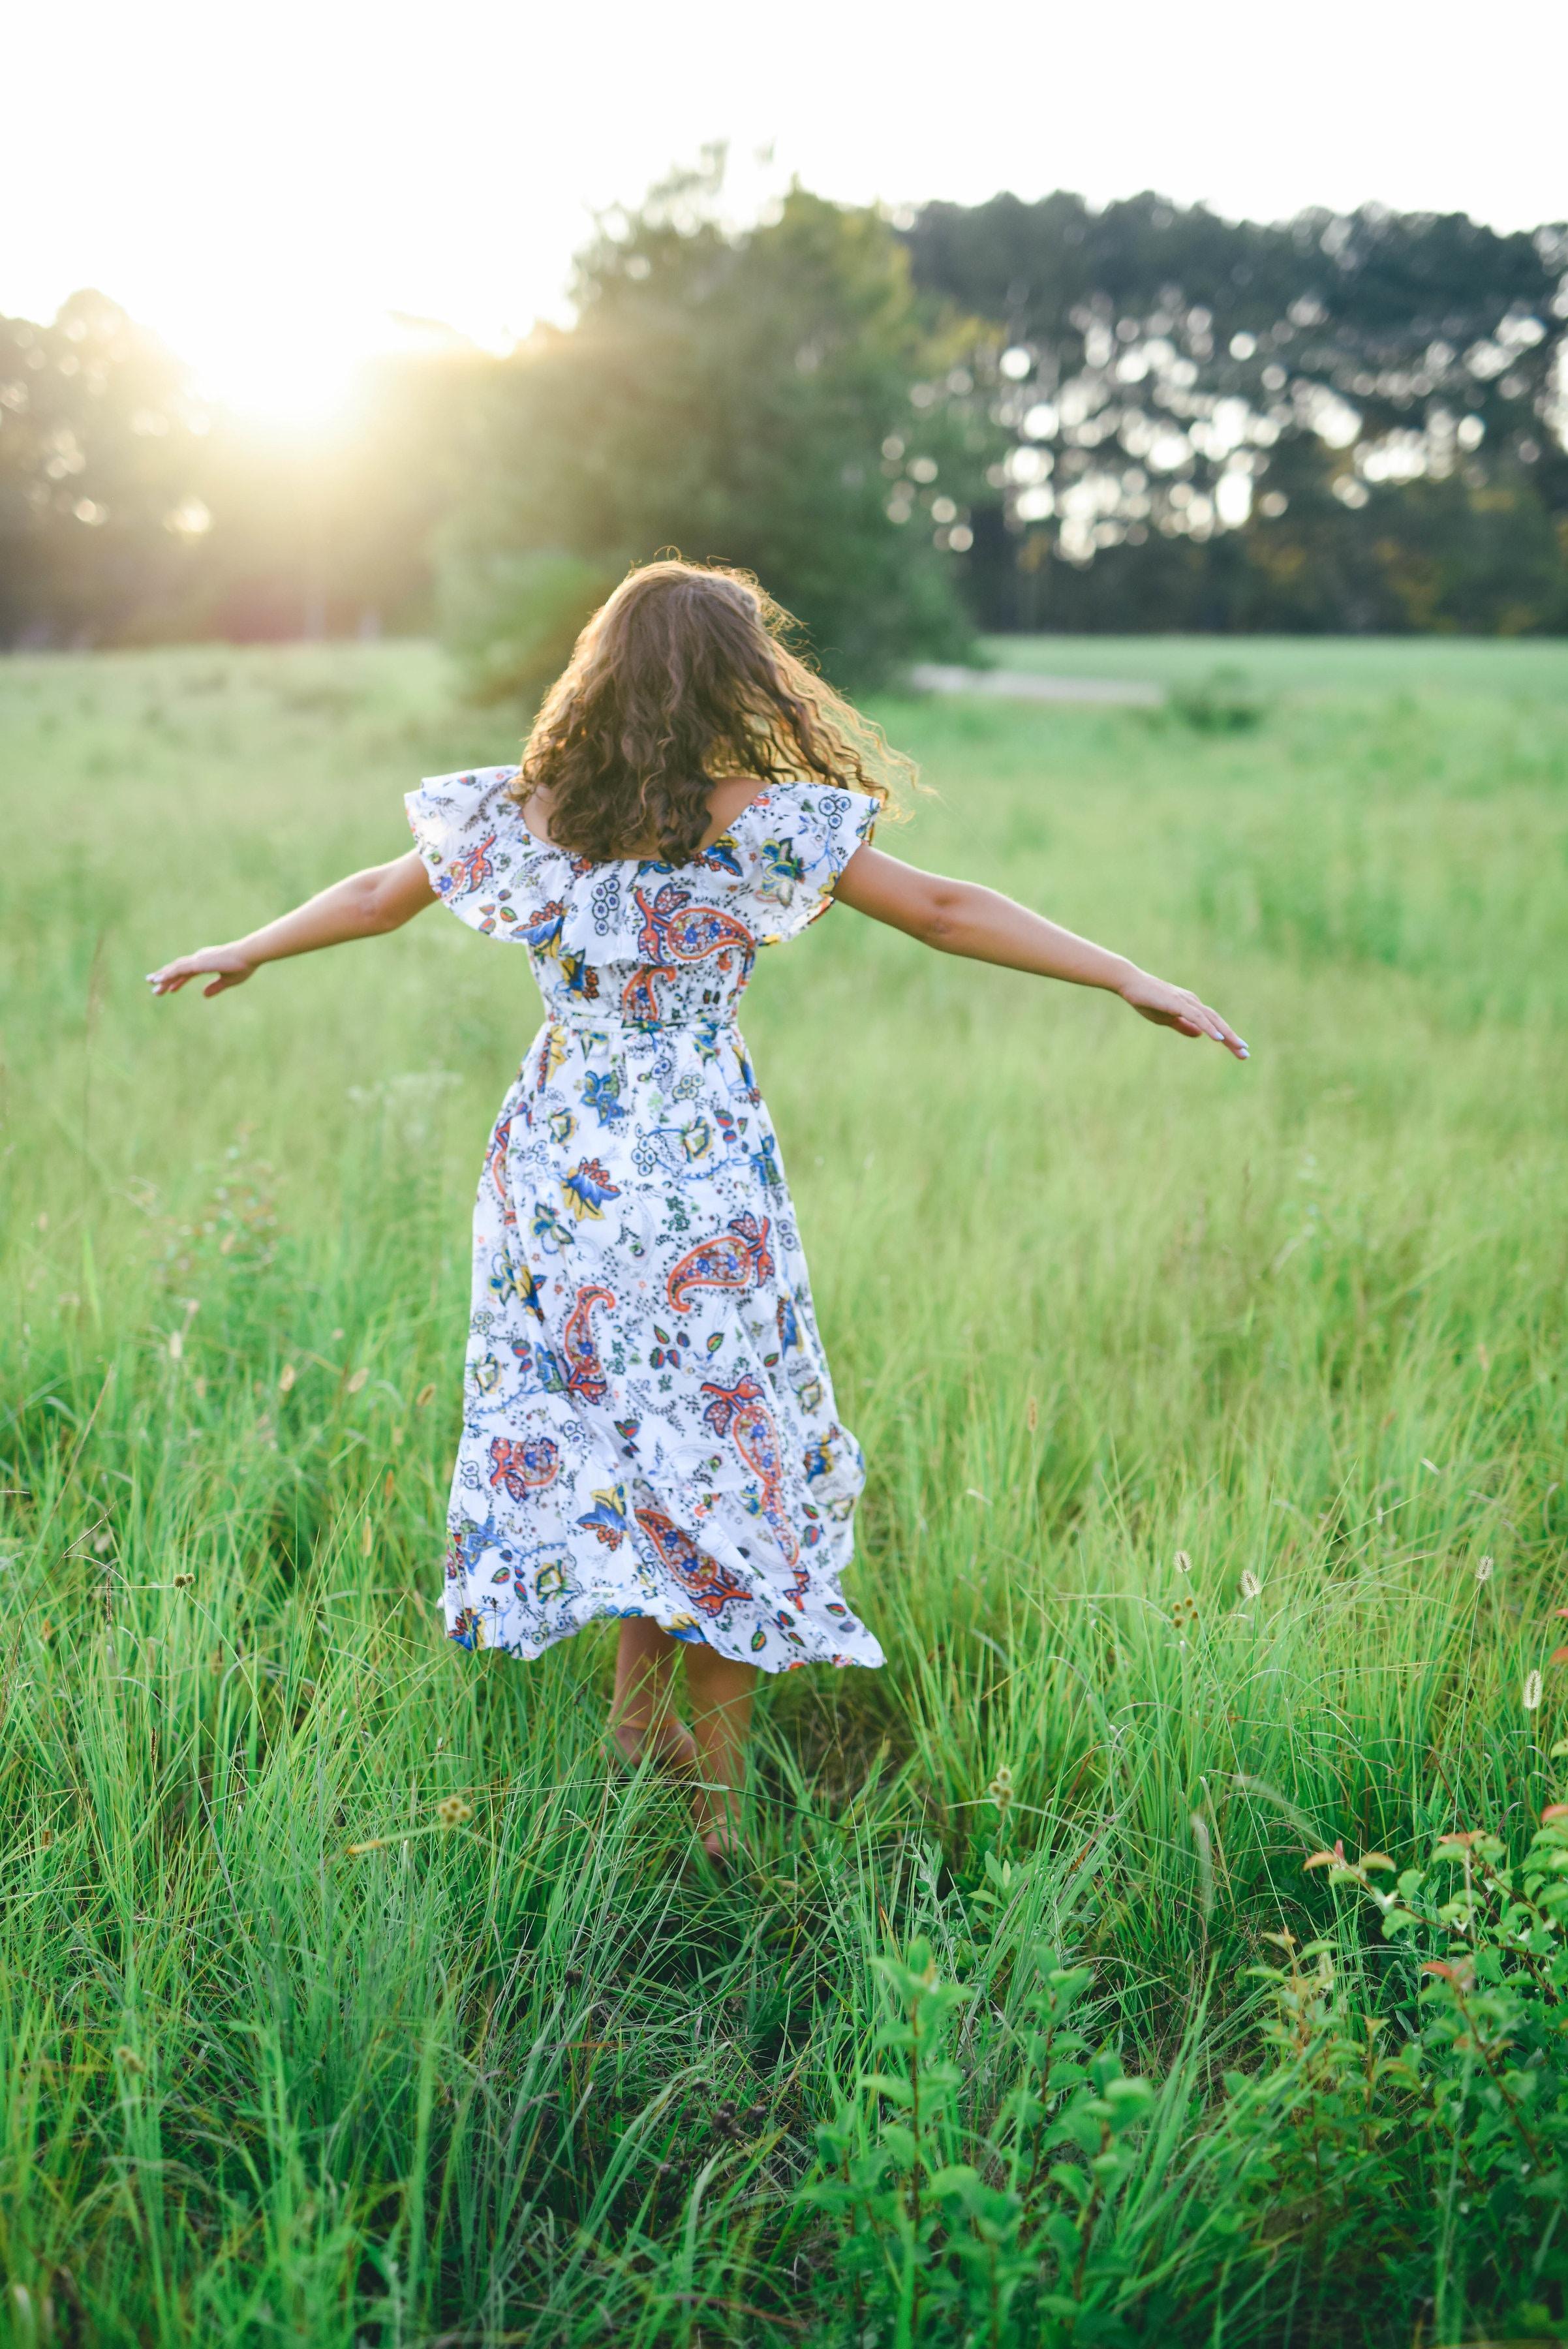 wild woman dancing